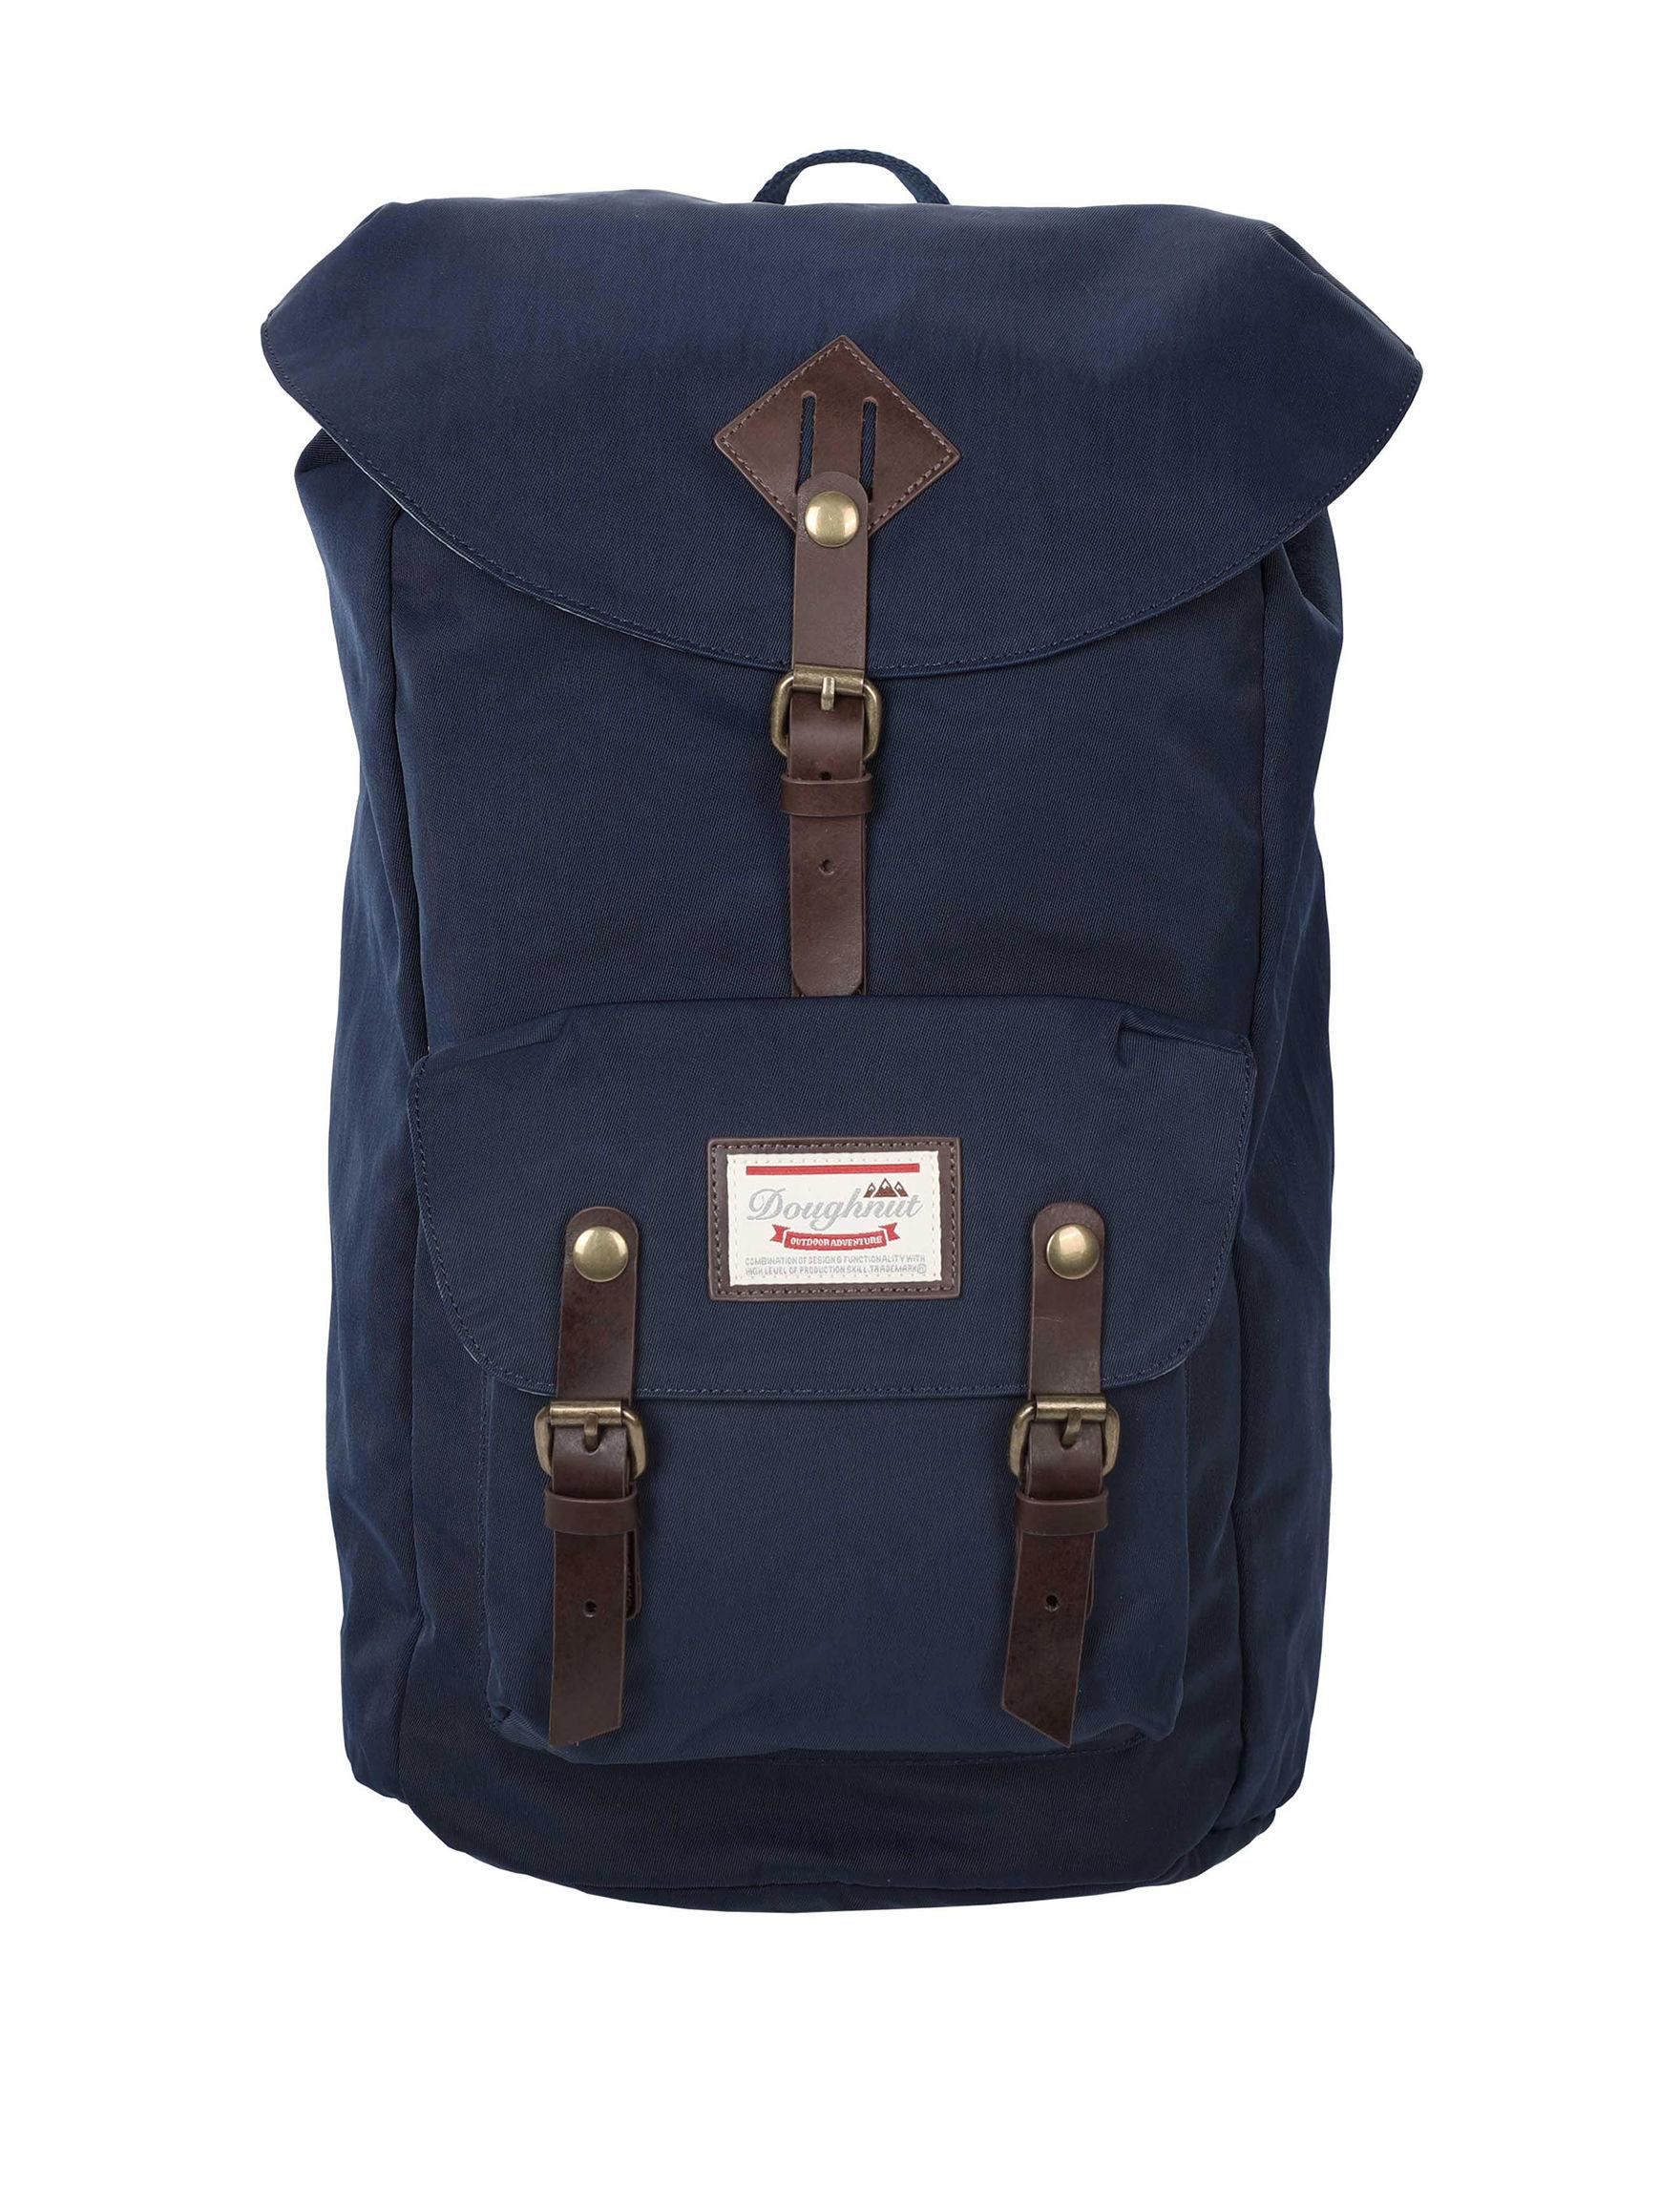 Doughnut Outdoor Gear Navy Bookbags & Backpacks